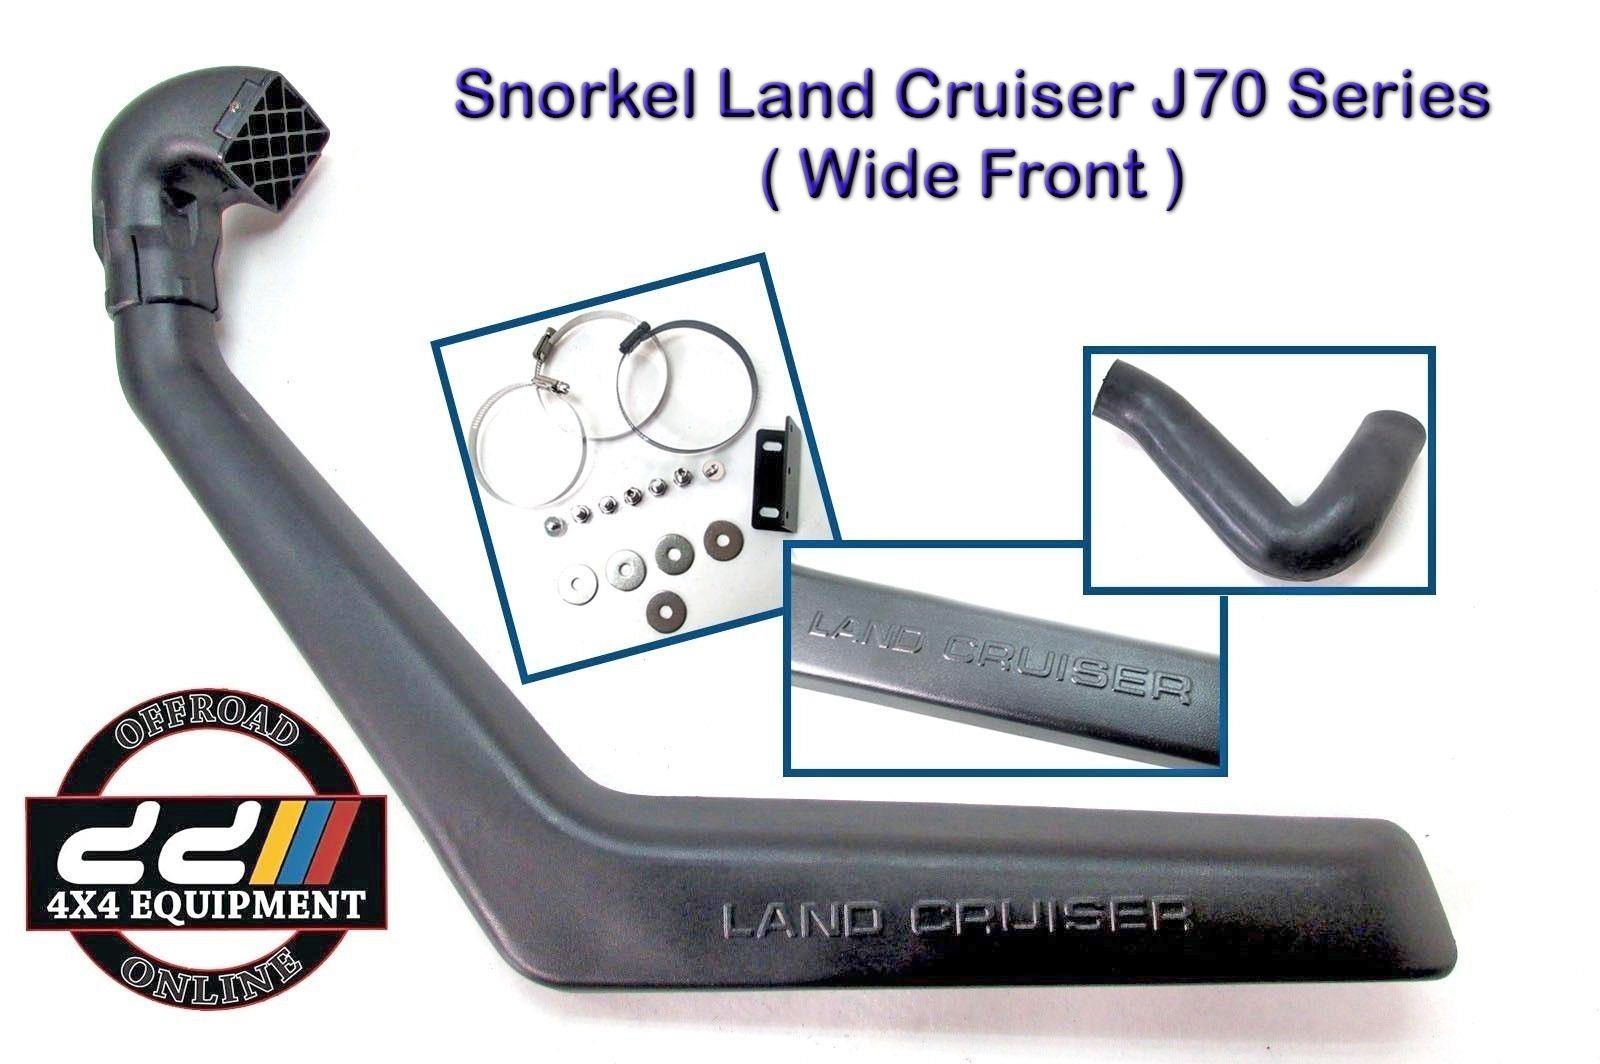 USエア インテーク シュノーケル スノーケルエアインテークキットはトヨタランドクルーザーHZJ76 HZJ78 VDJ76 VDJ78 ST076Aに適合 Snorkel Air Intake Kit Fits Toyota Land Cruiser HZJ76 HZJ78 VDJ76 VDJ78 ST076A